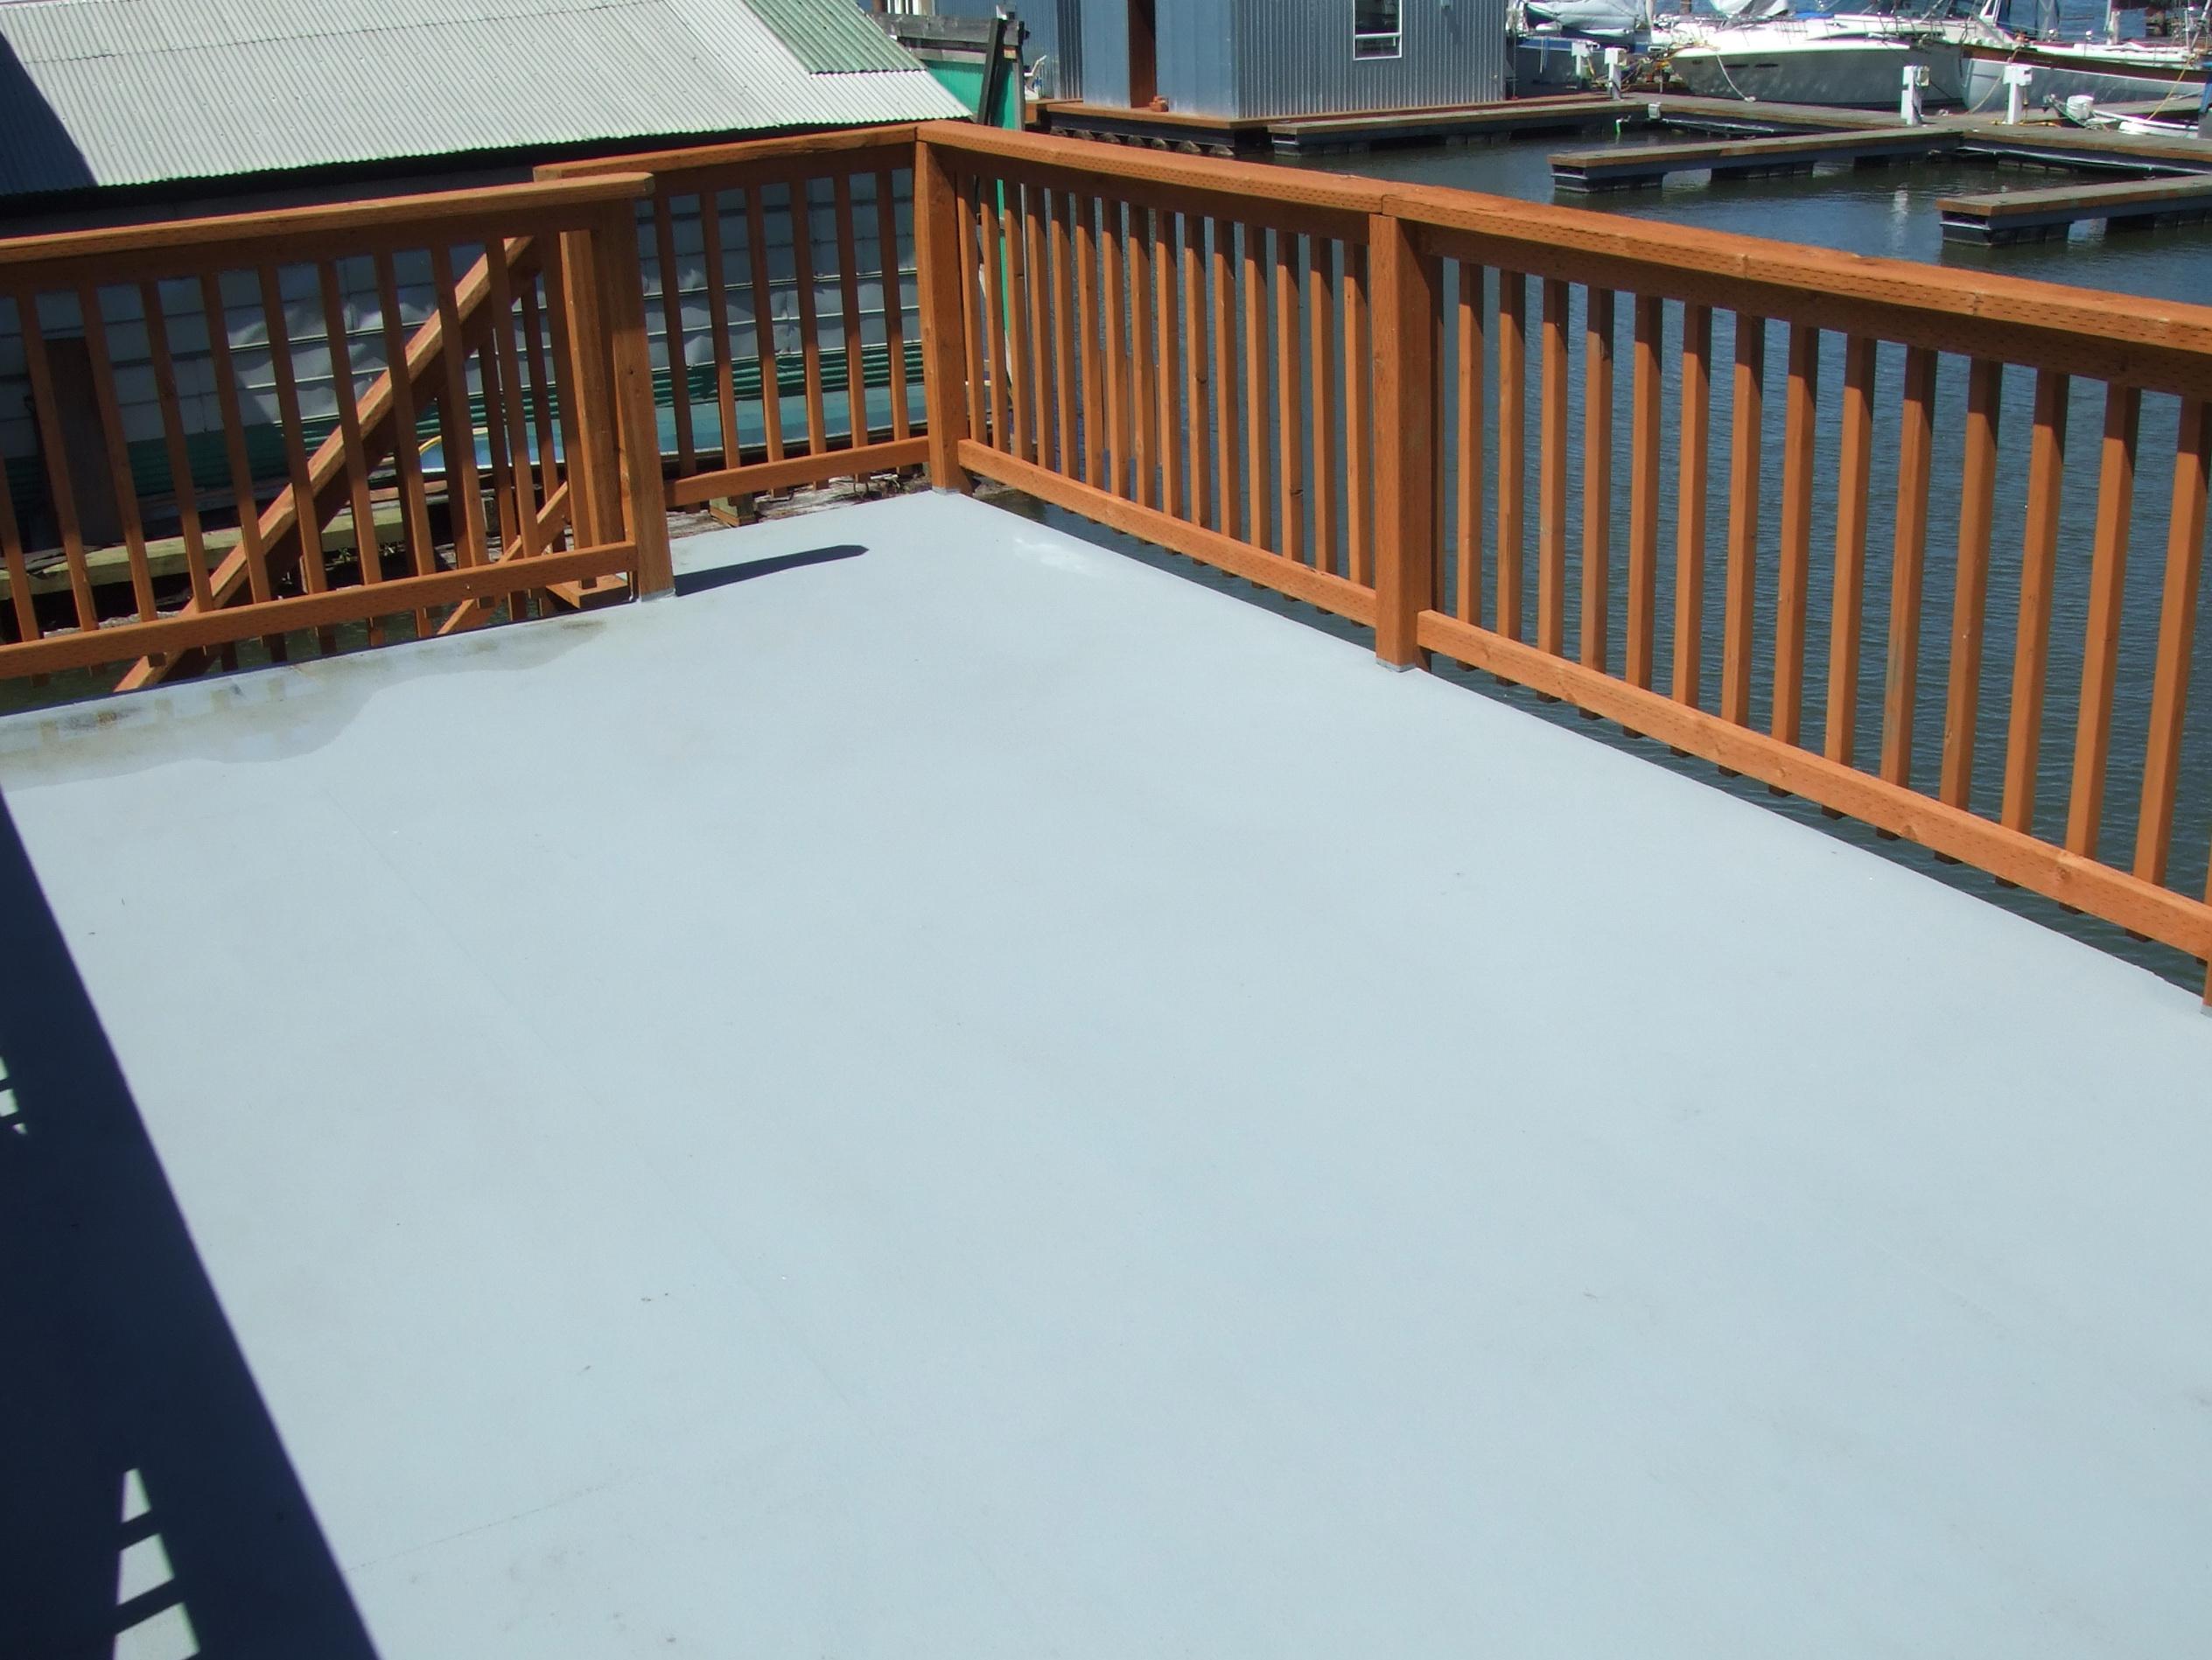 Home depot deck paint home design ideas for Home depot deck designer